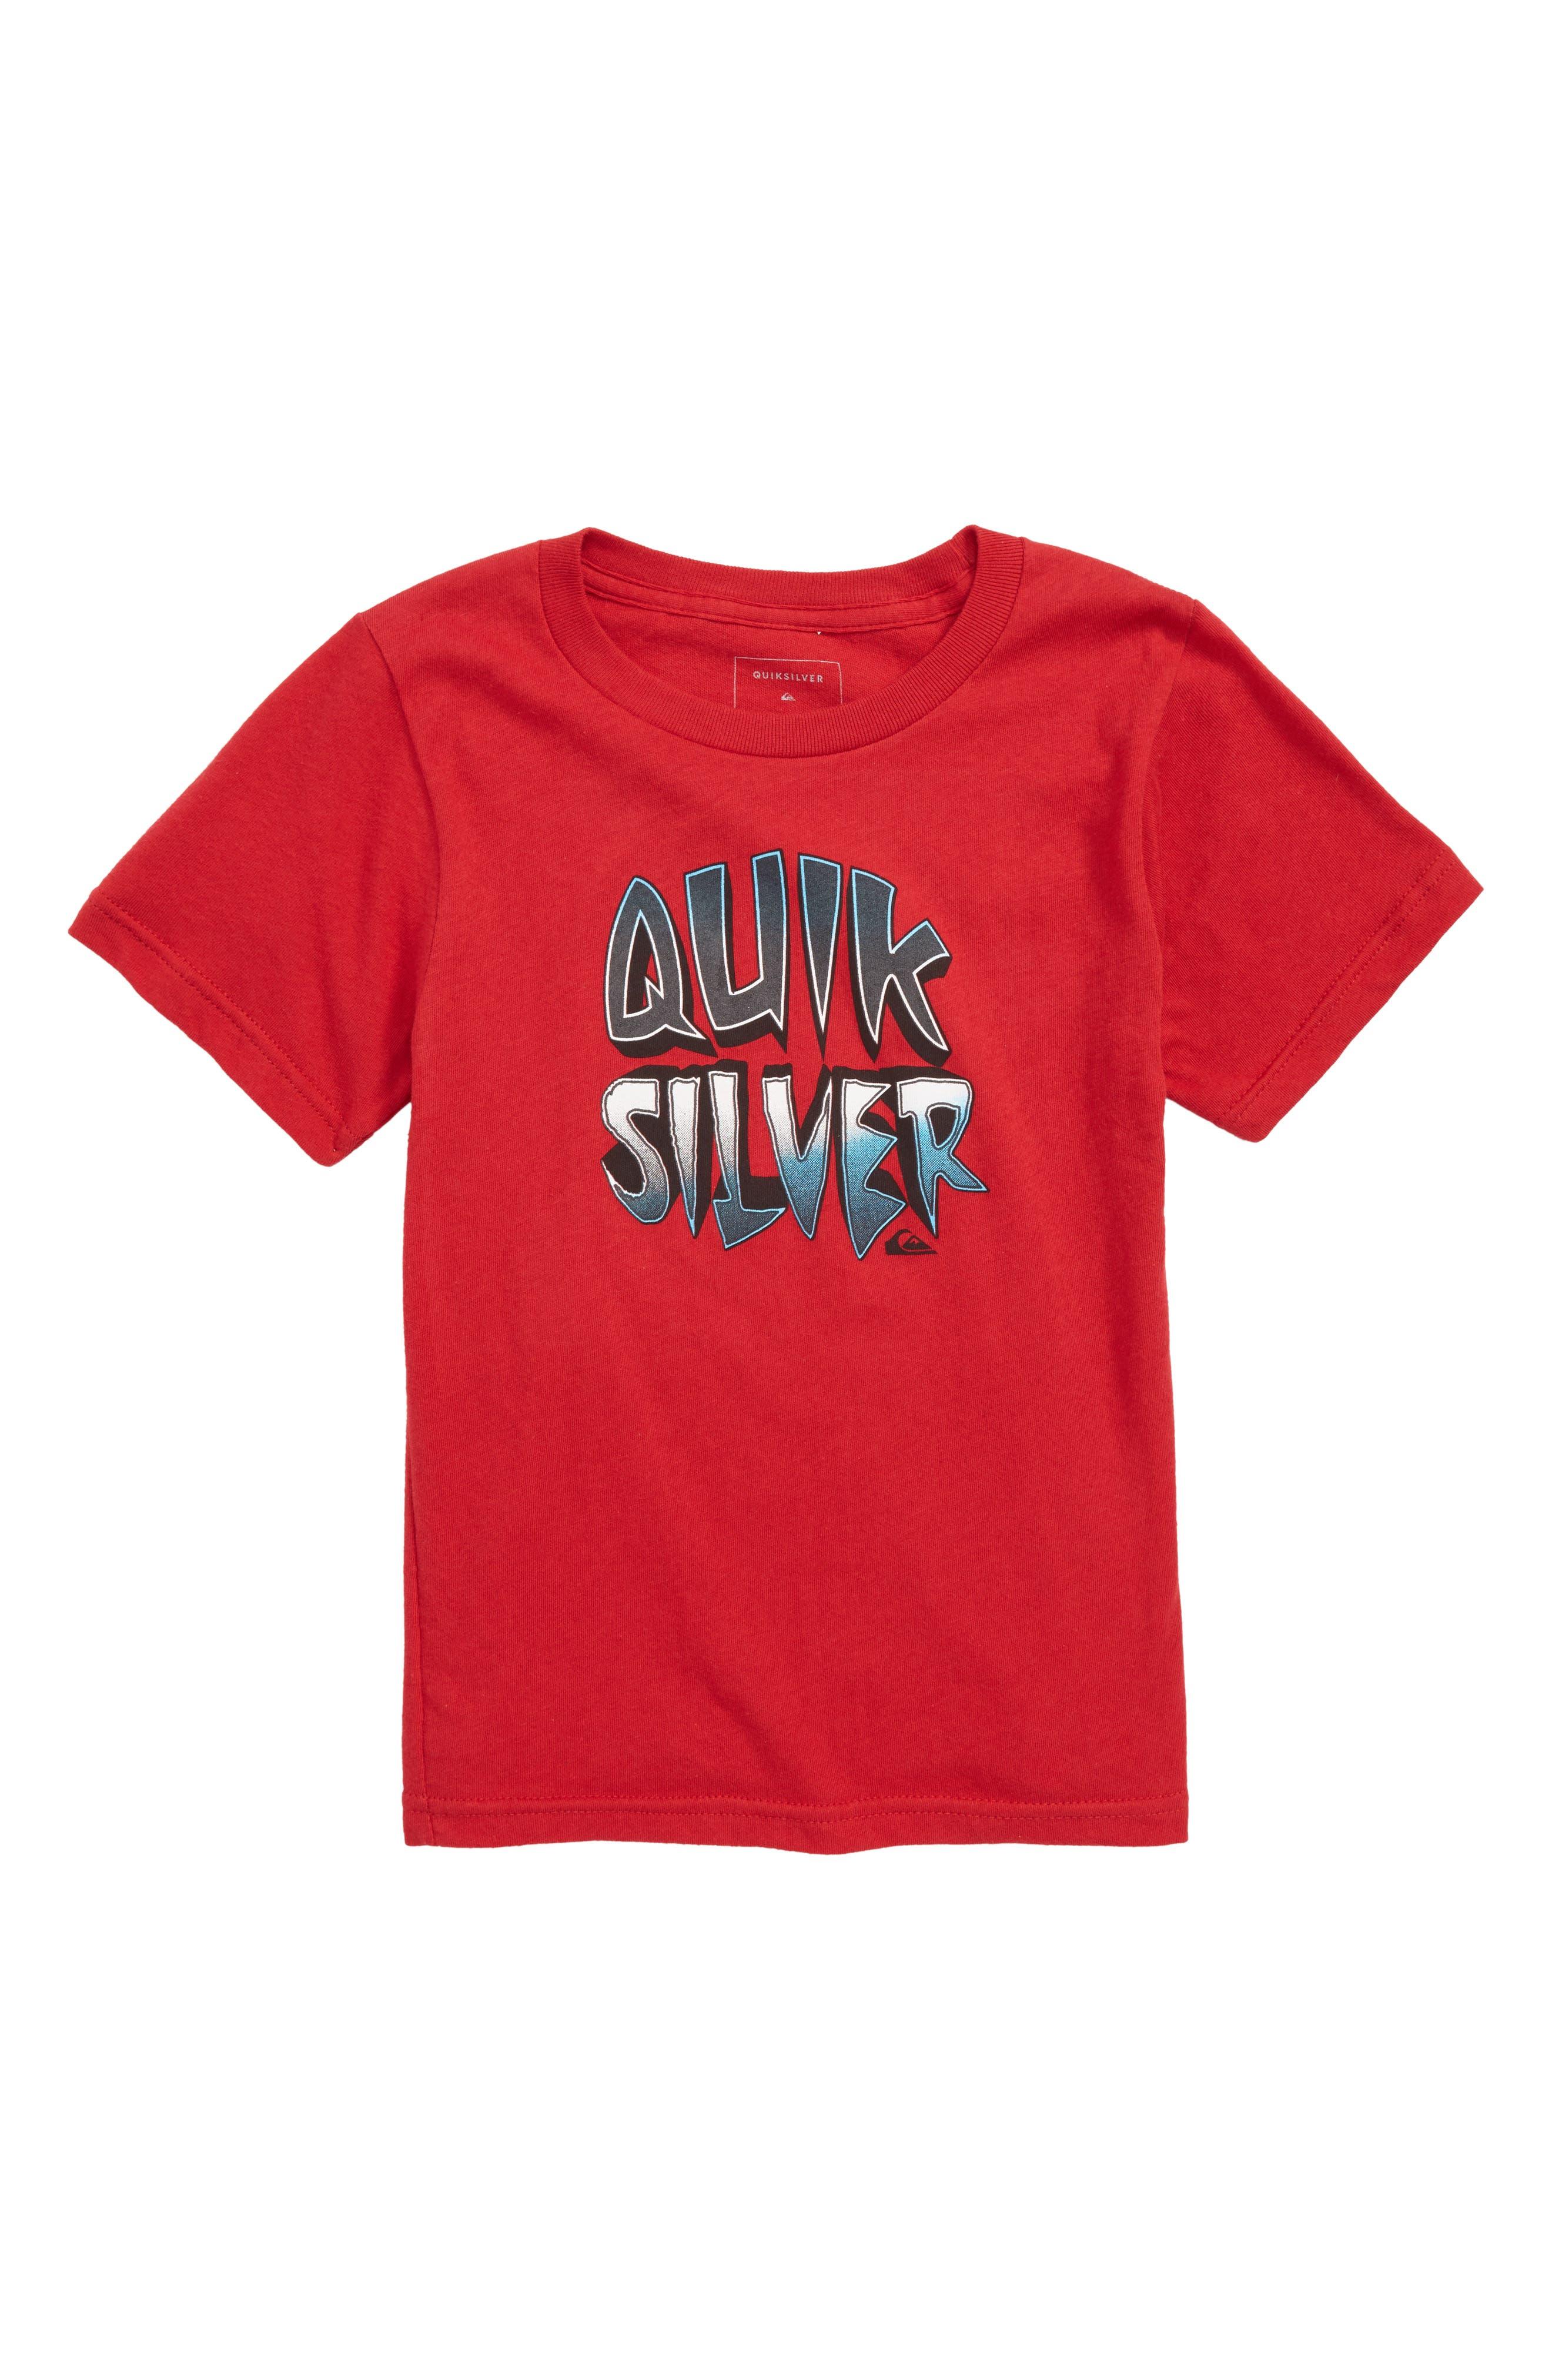 Quiksilver Capt Cavern Graphic T-Shirt (Toddler Boys & Little Boys)